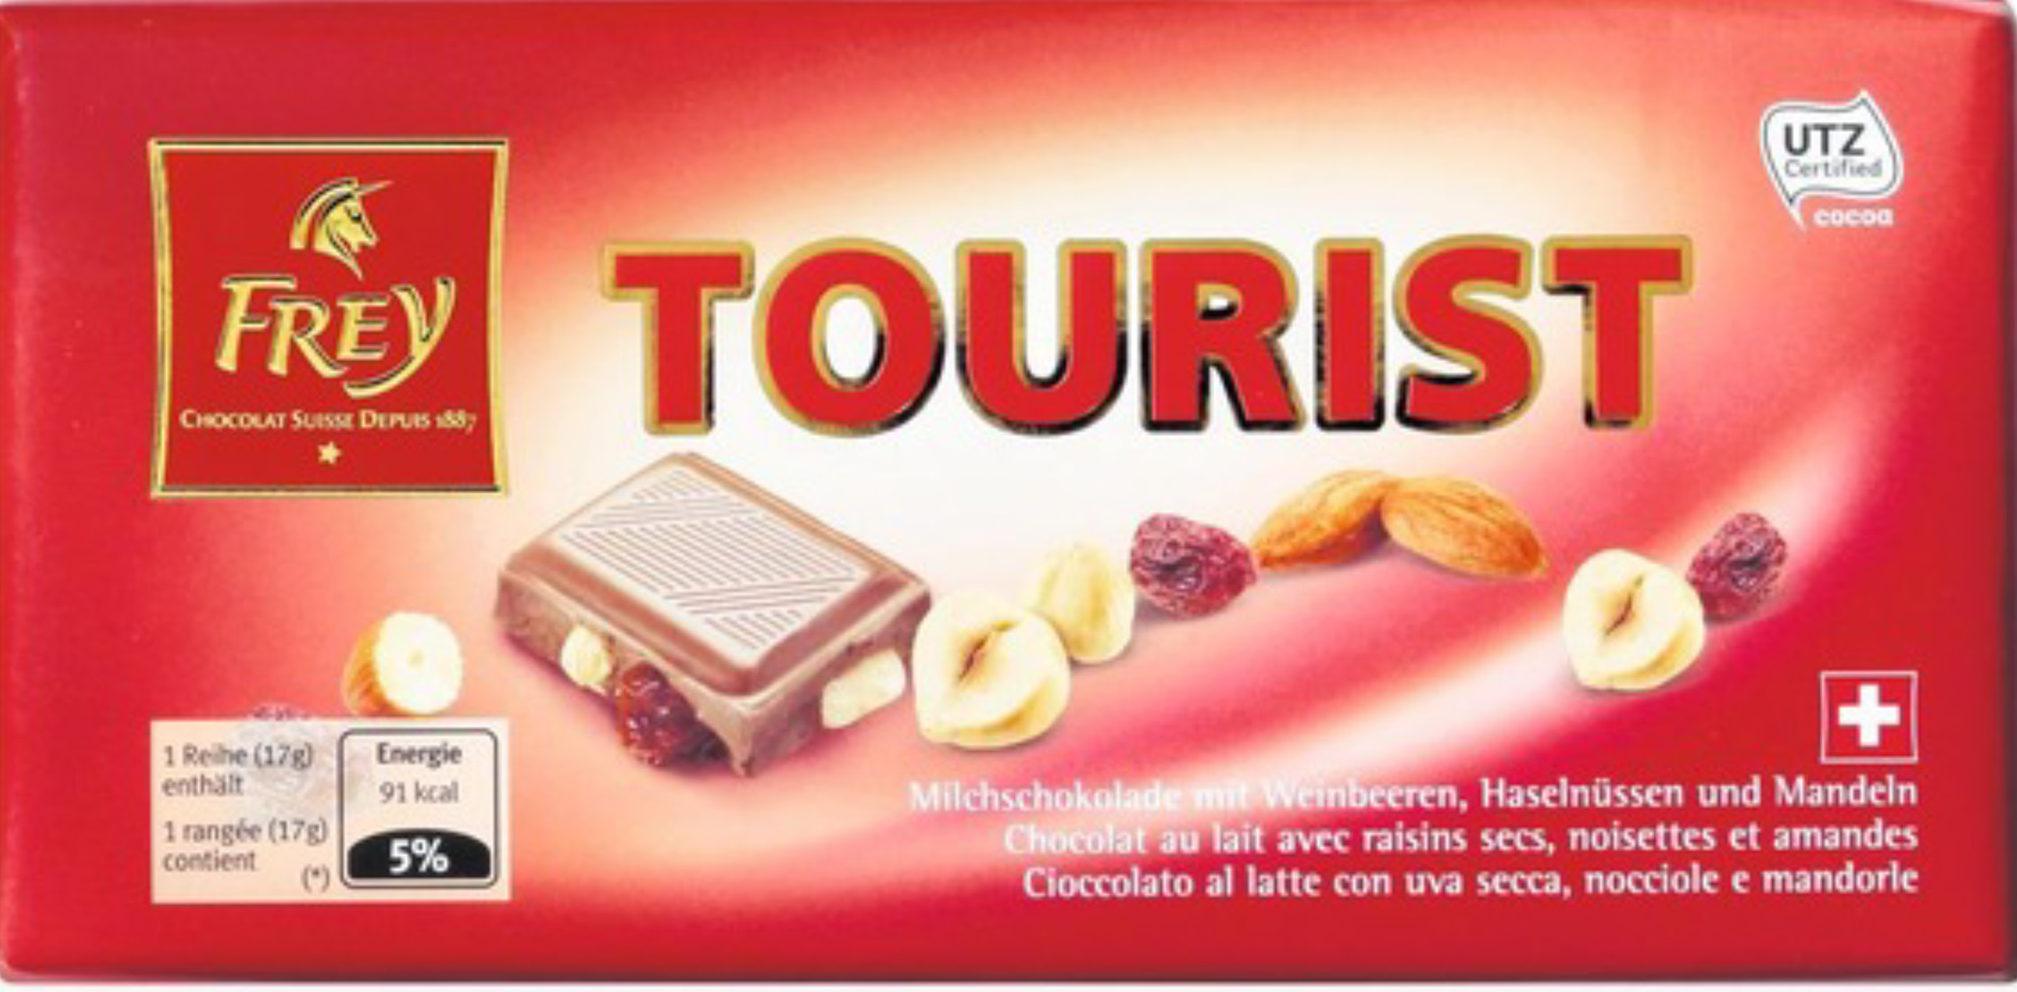 Chocolat Tourist - Product